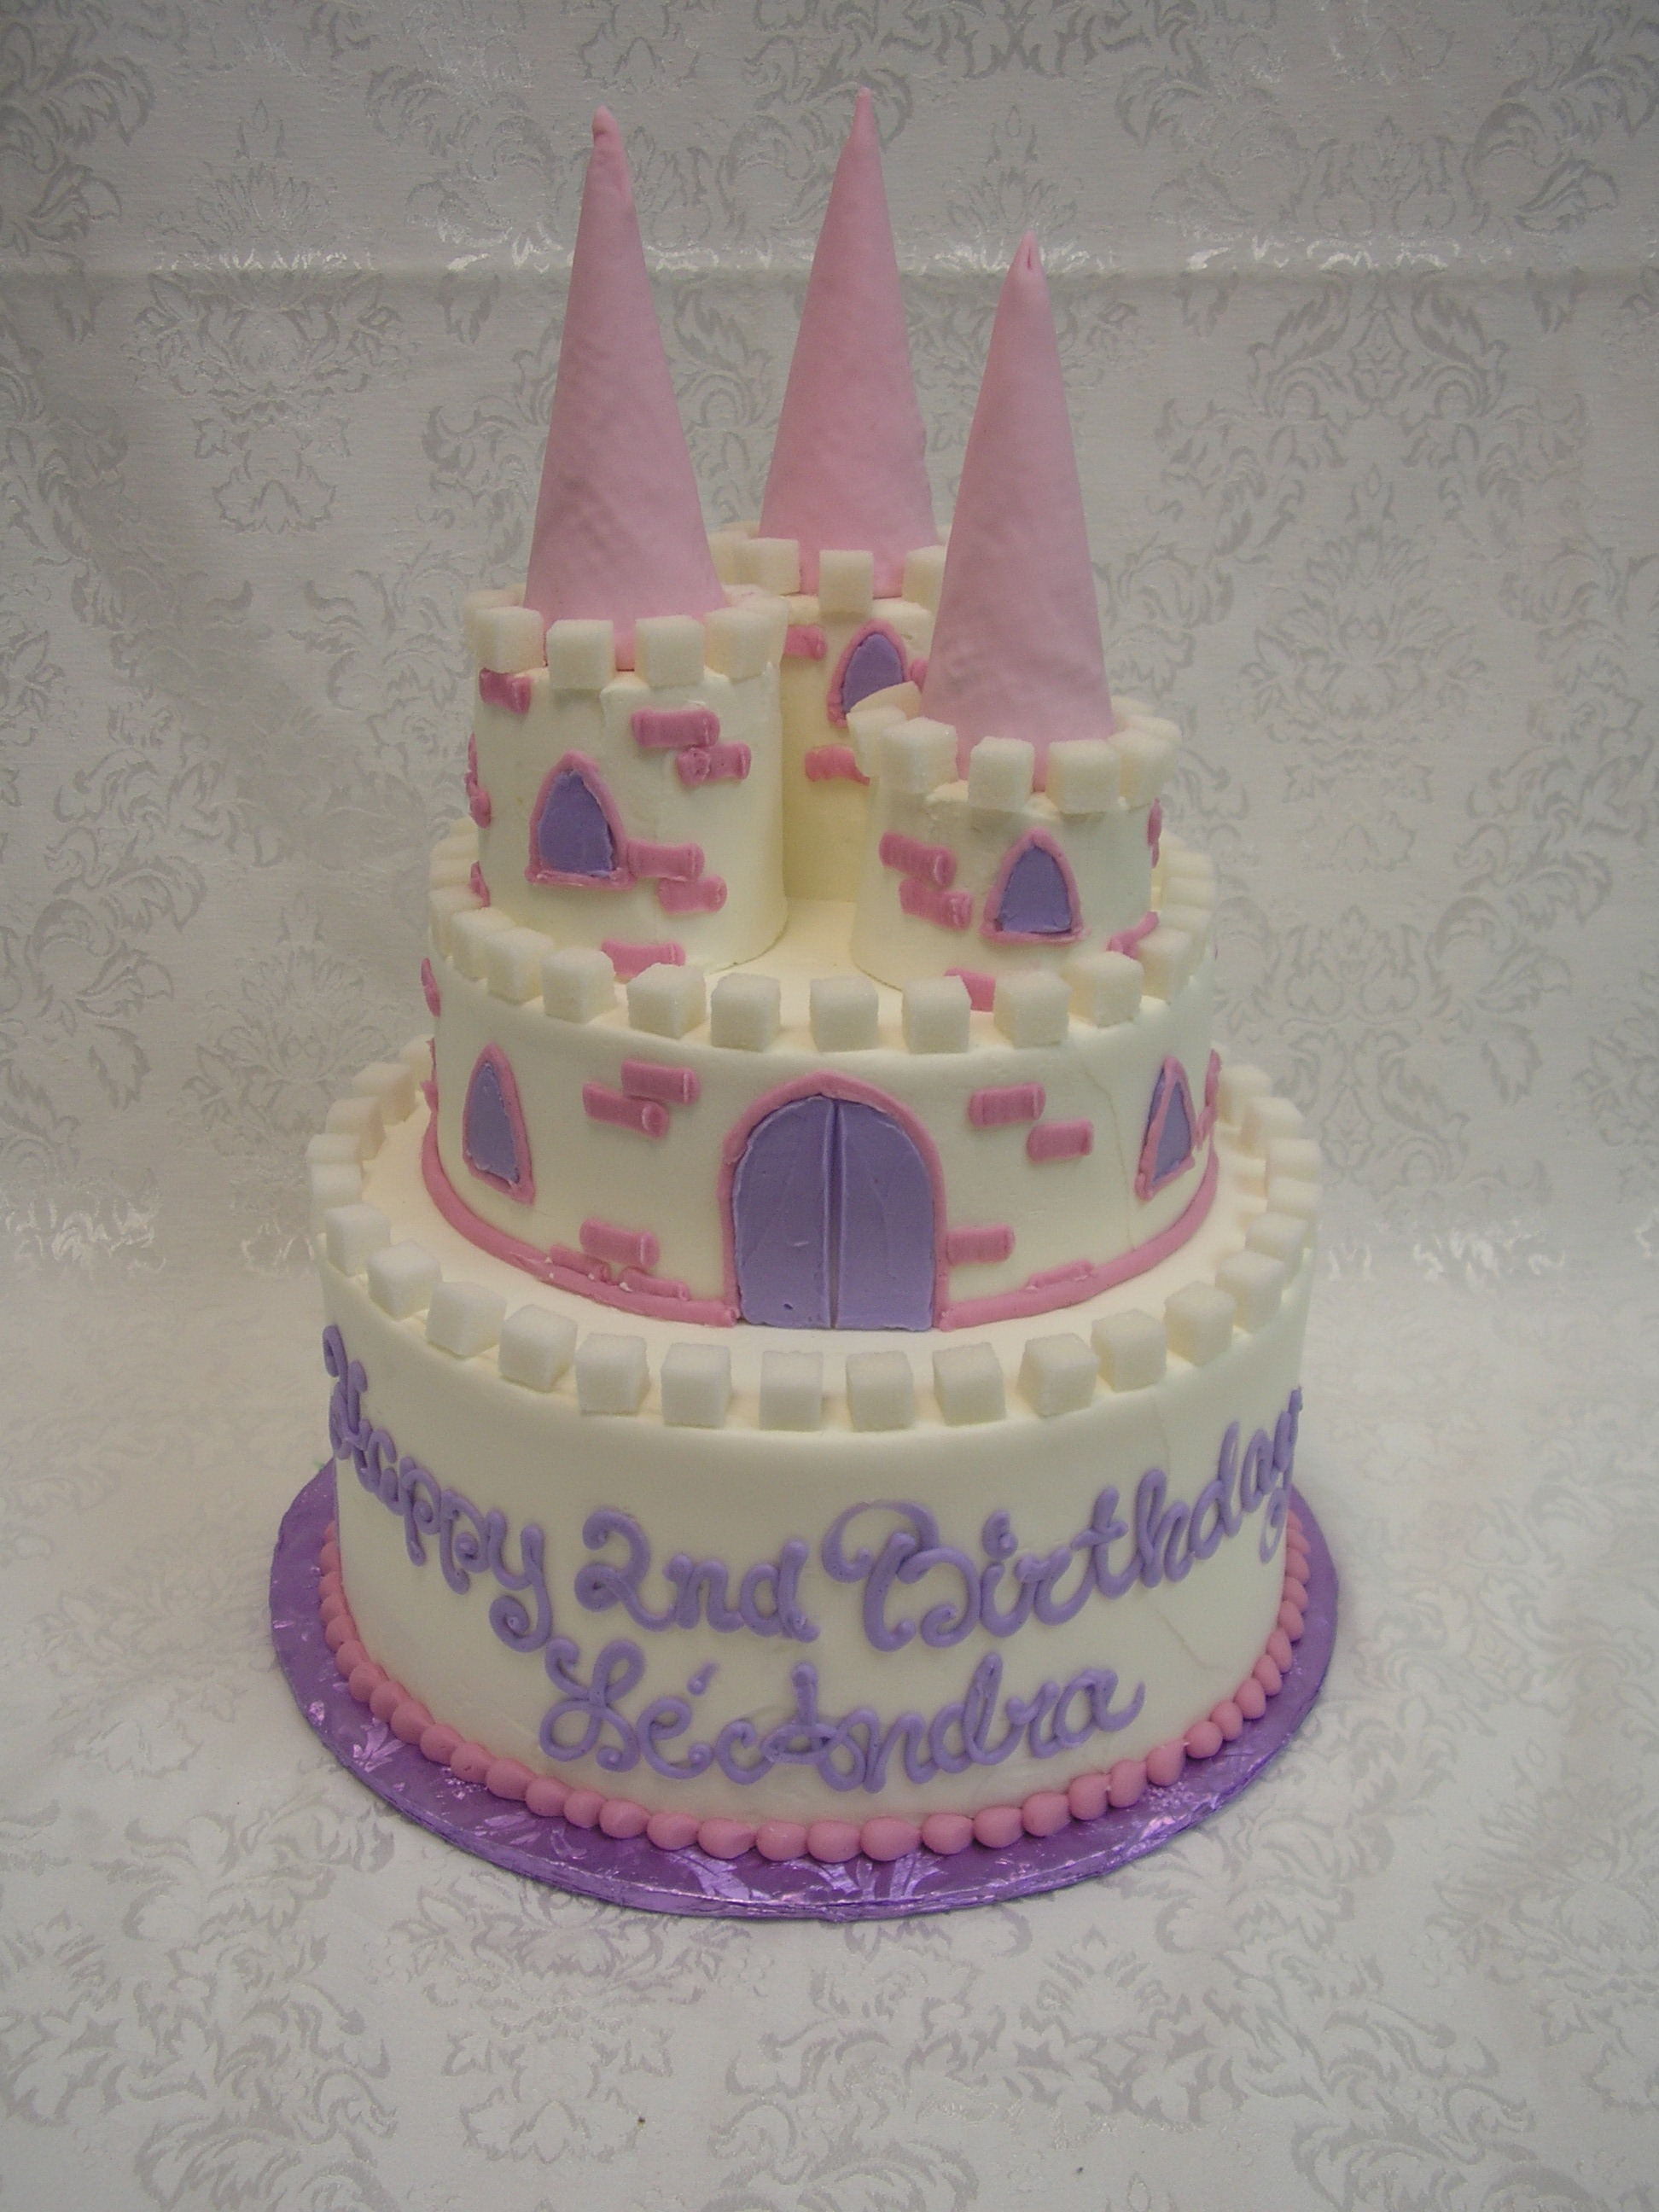 2 tier castle cake, 3d turrets on a 2 tier castle cake